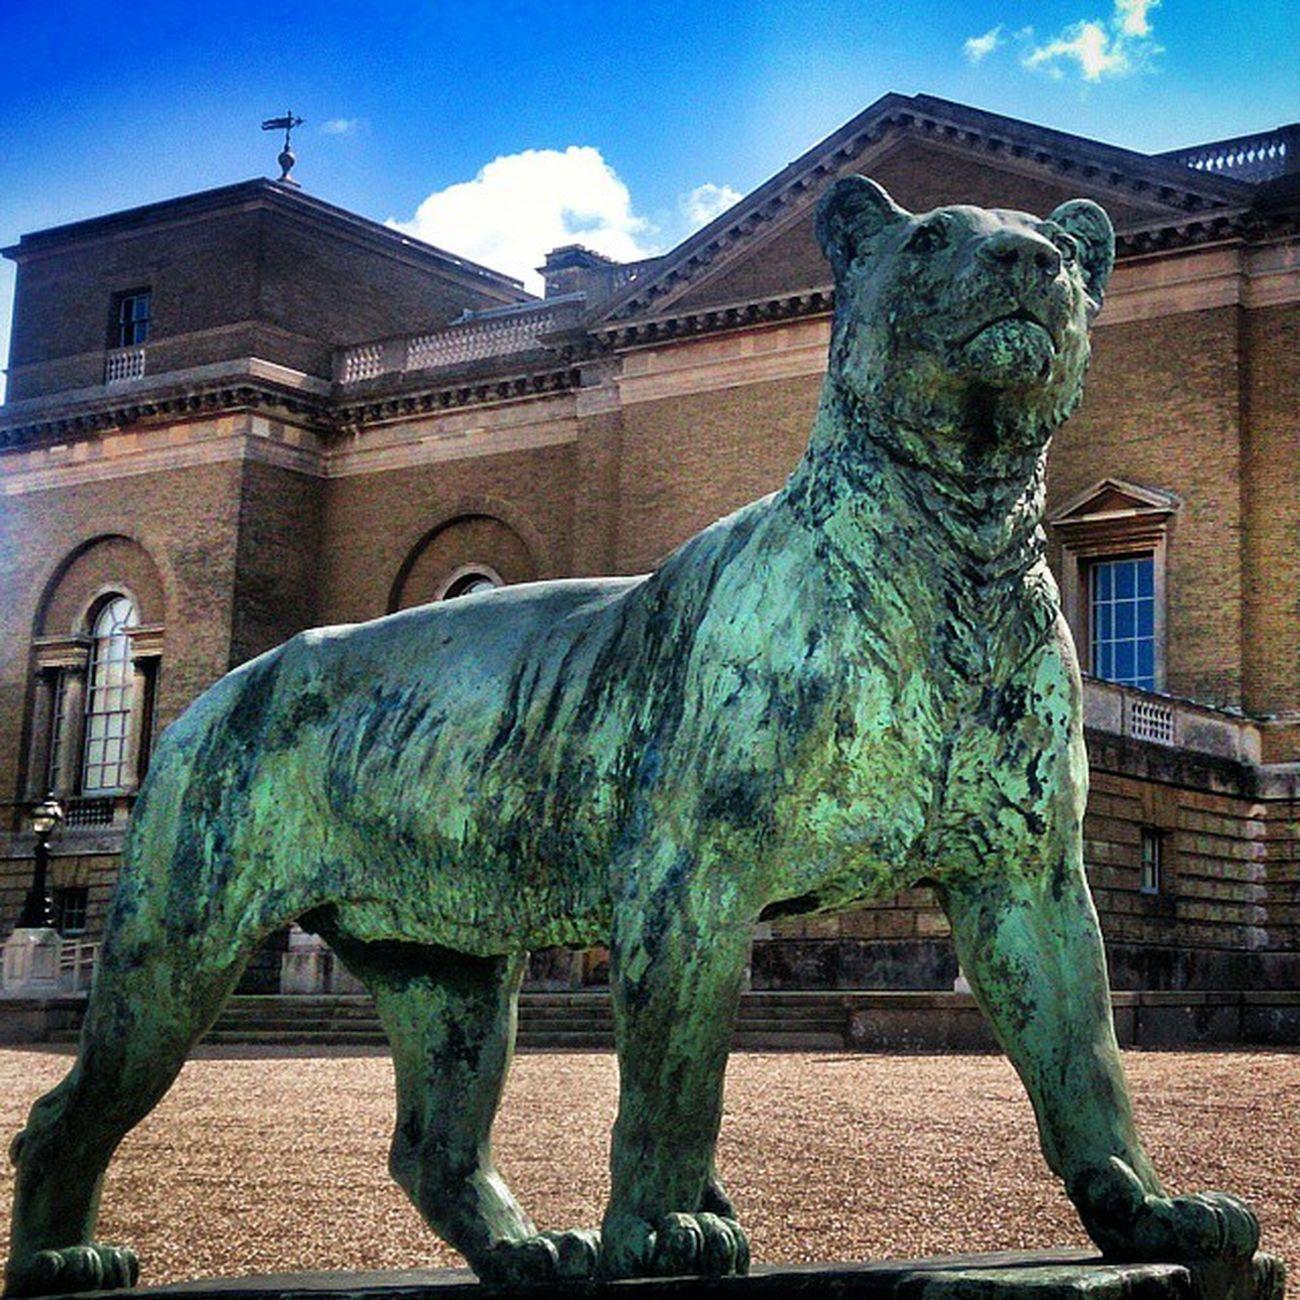 Holkham Holkhamhall Lion Statues statueporn statue lion archilovers architecture architectureporn architexture architecturelovers archidaily cloudporn skyporn art building_shotz buildings buildingstylesgf